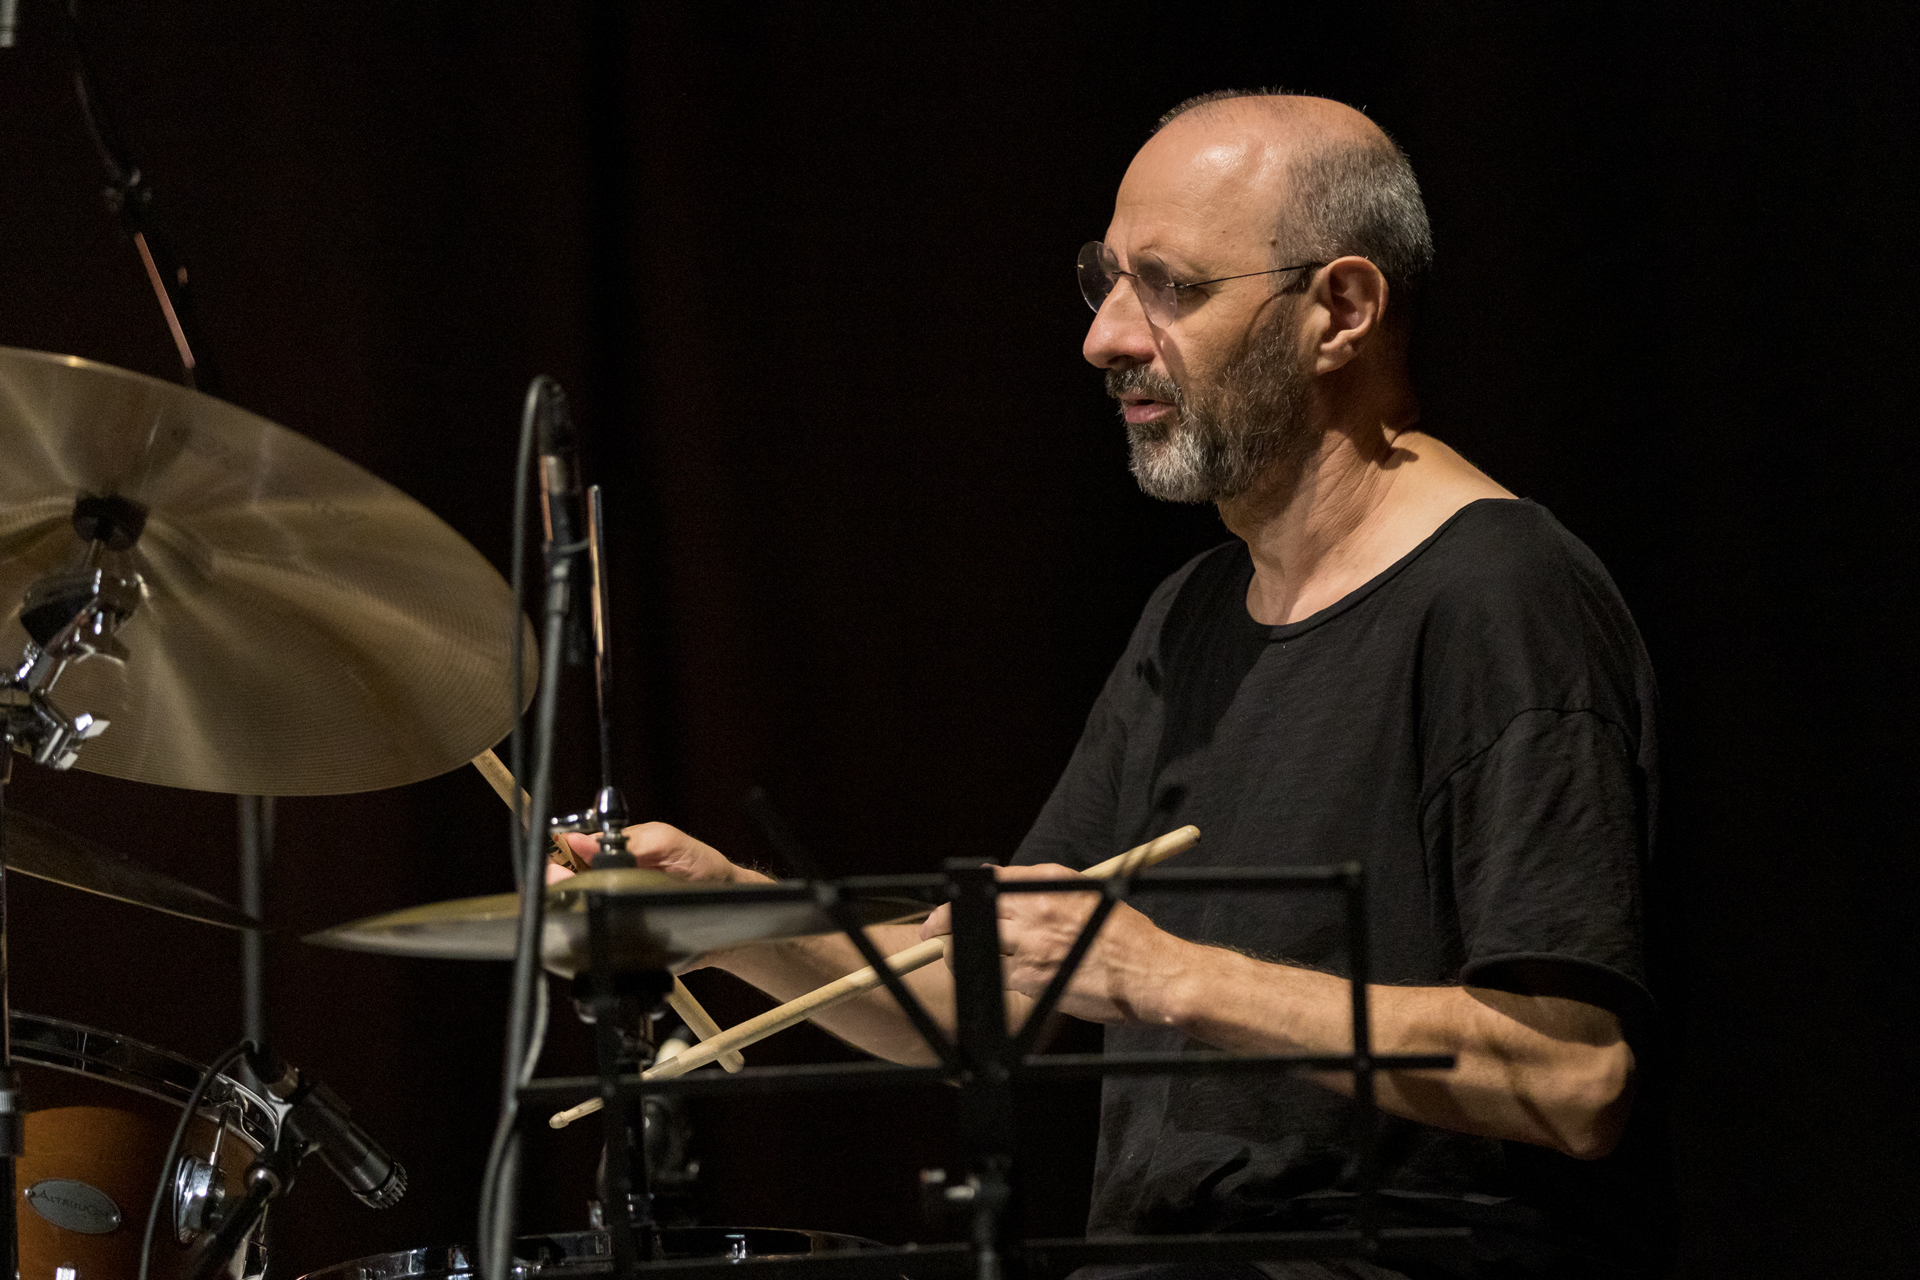 2019_09_13-Iverson-Sanders-Rossy-Trio-©-Luca-Vantusso-225452-EOSR6771